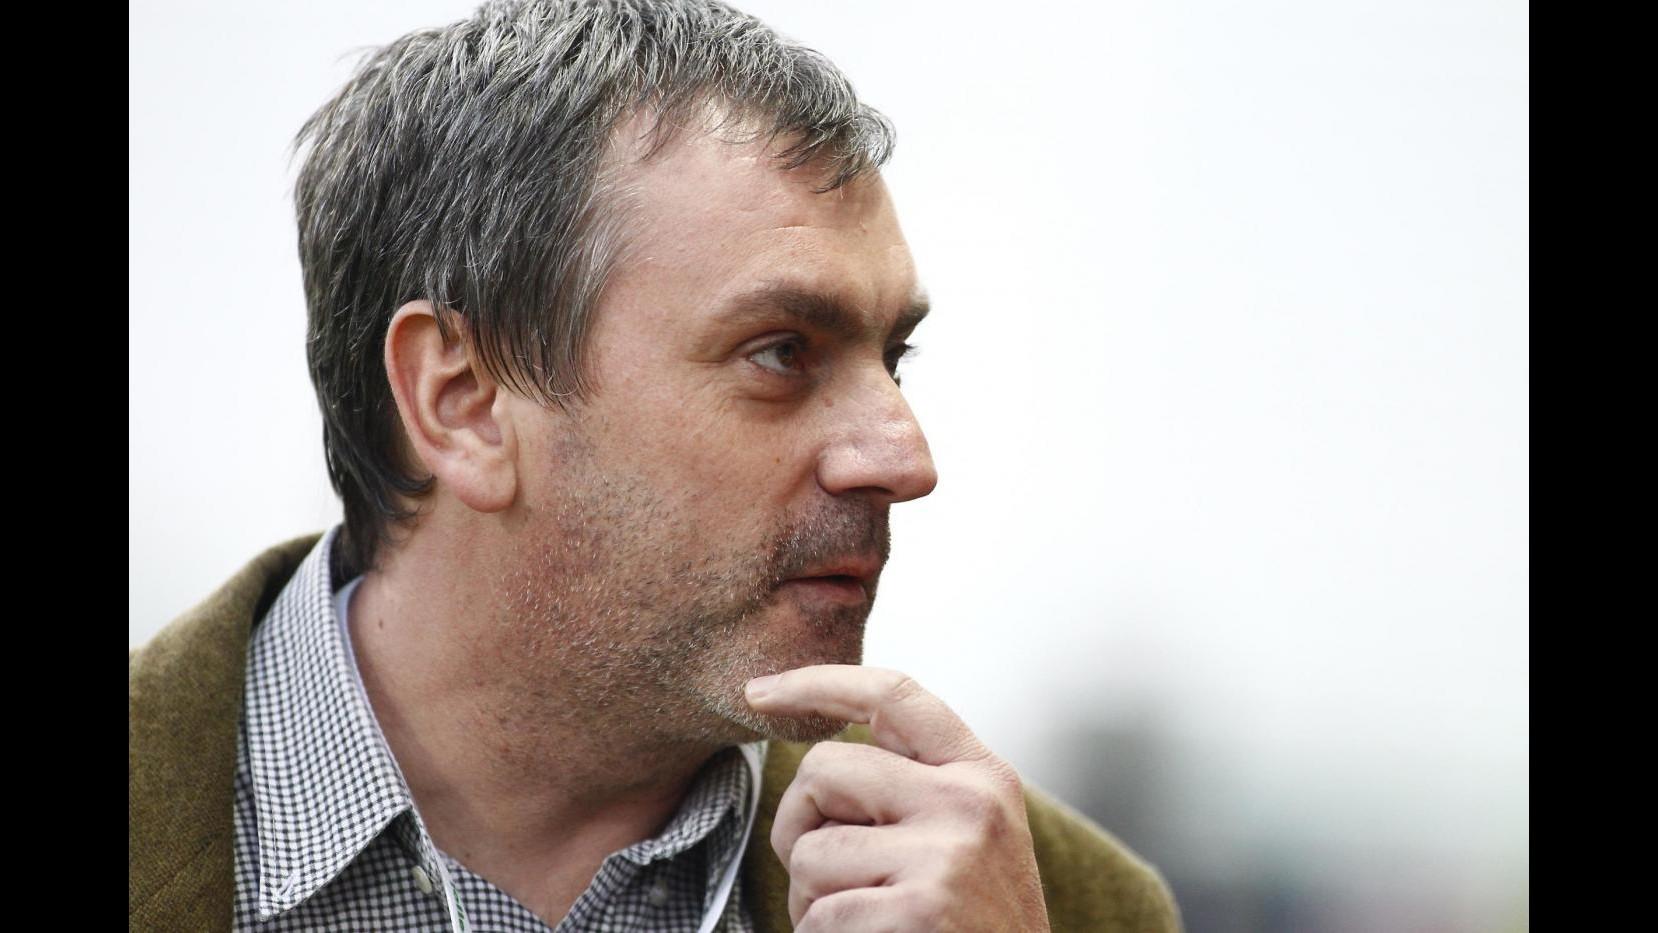 Calcio, Tribunale Figc: rinnovata sospensione ex patron Parma Manenti